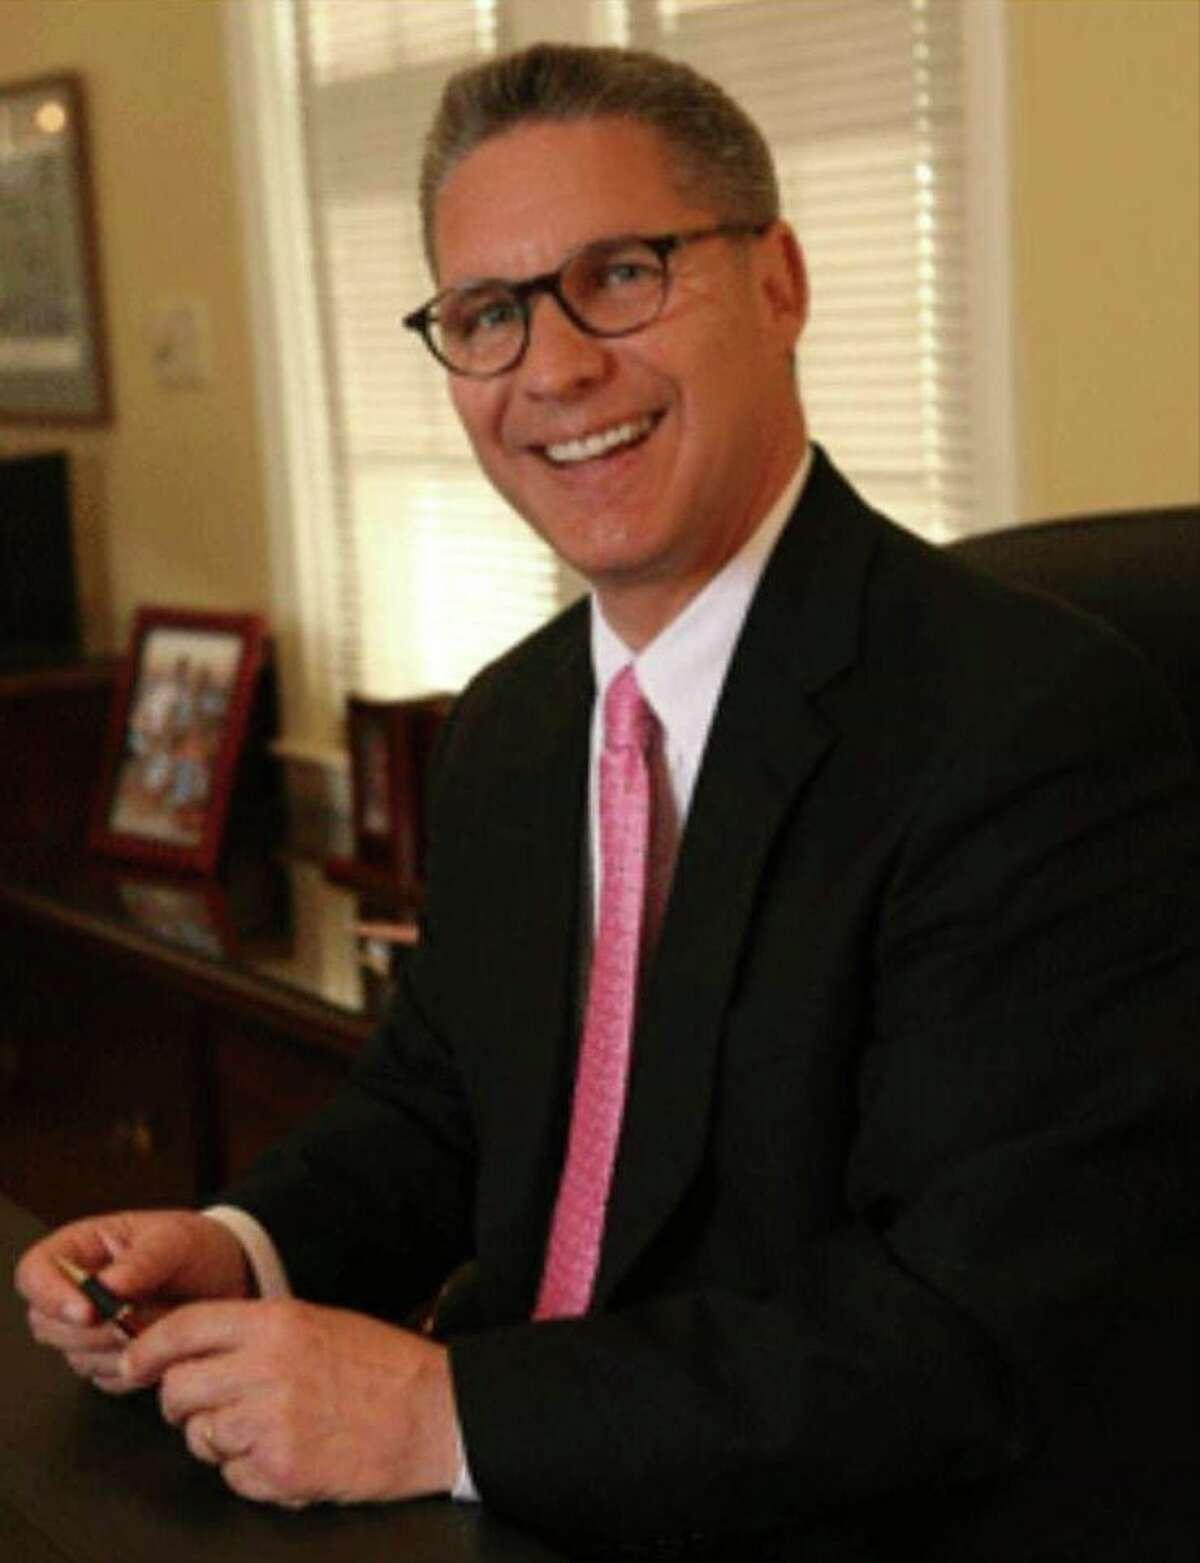 David J. Klein has been named the new president of St. Joseph High School.